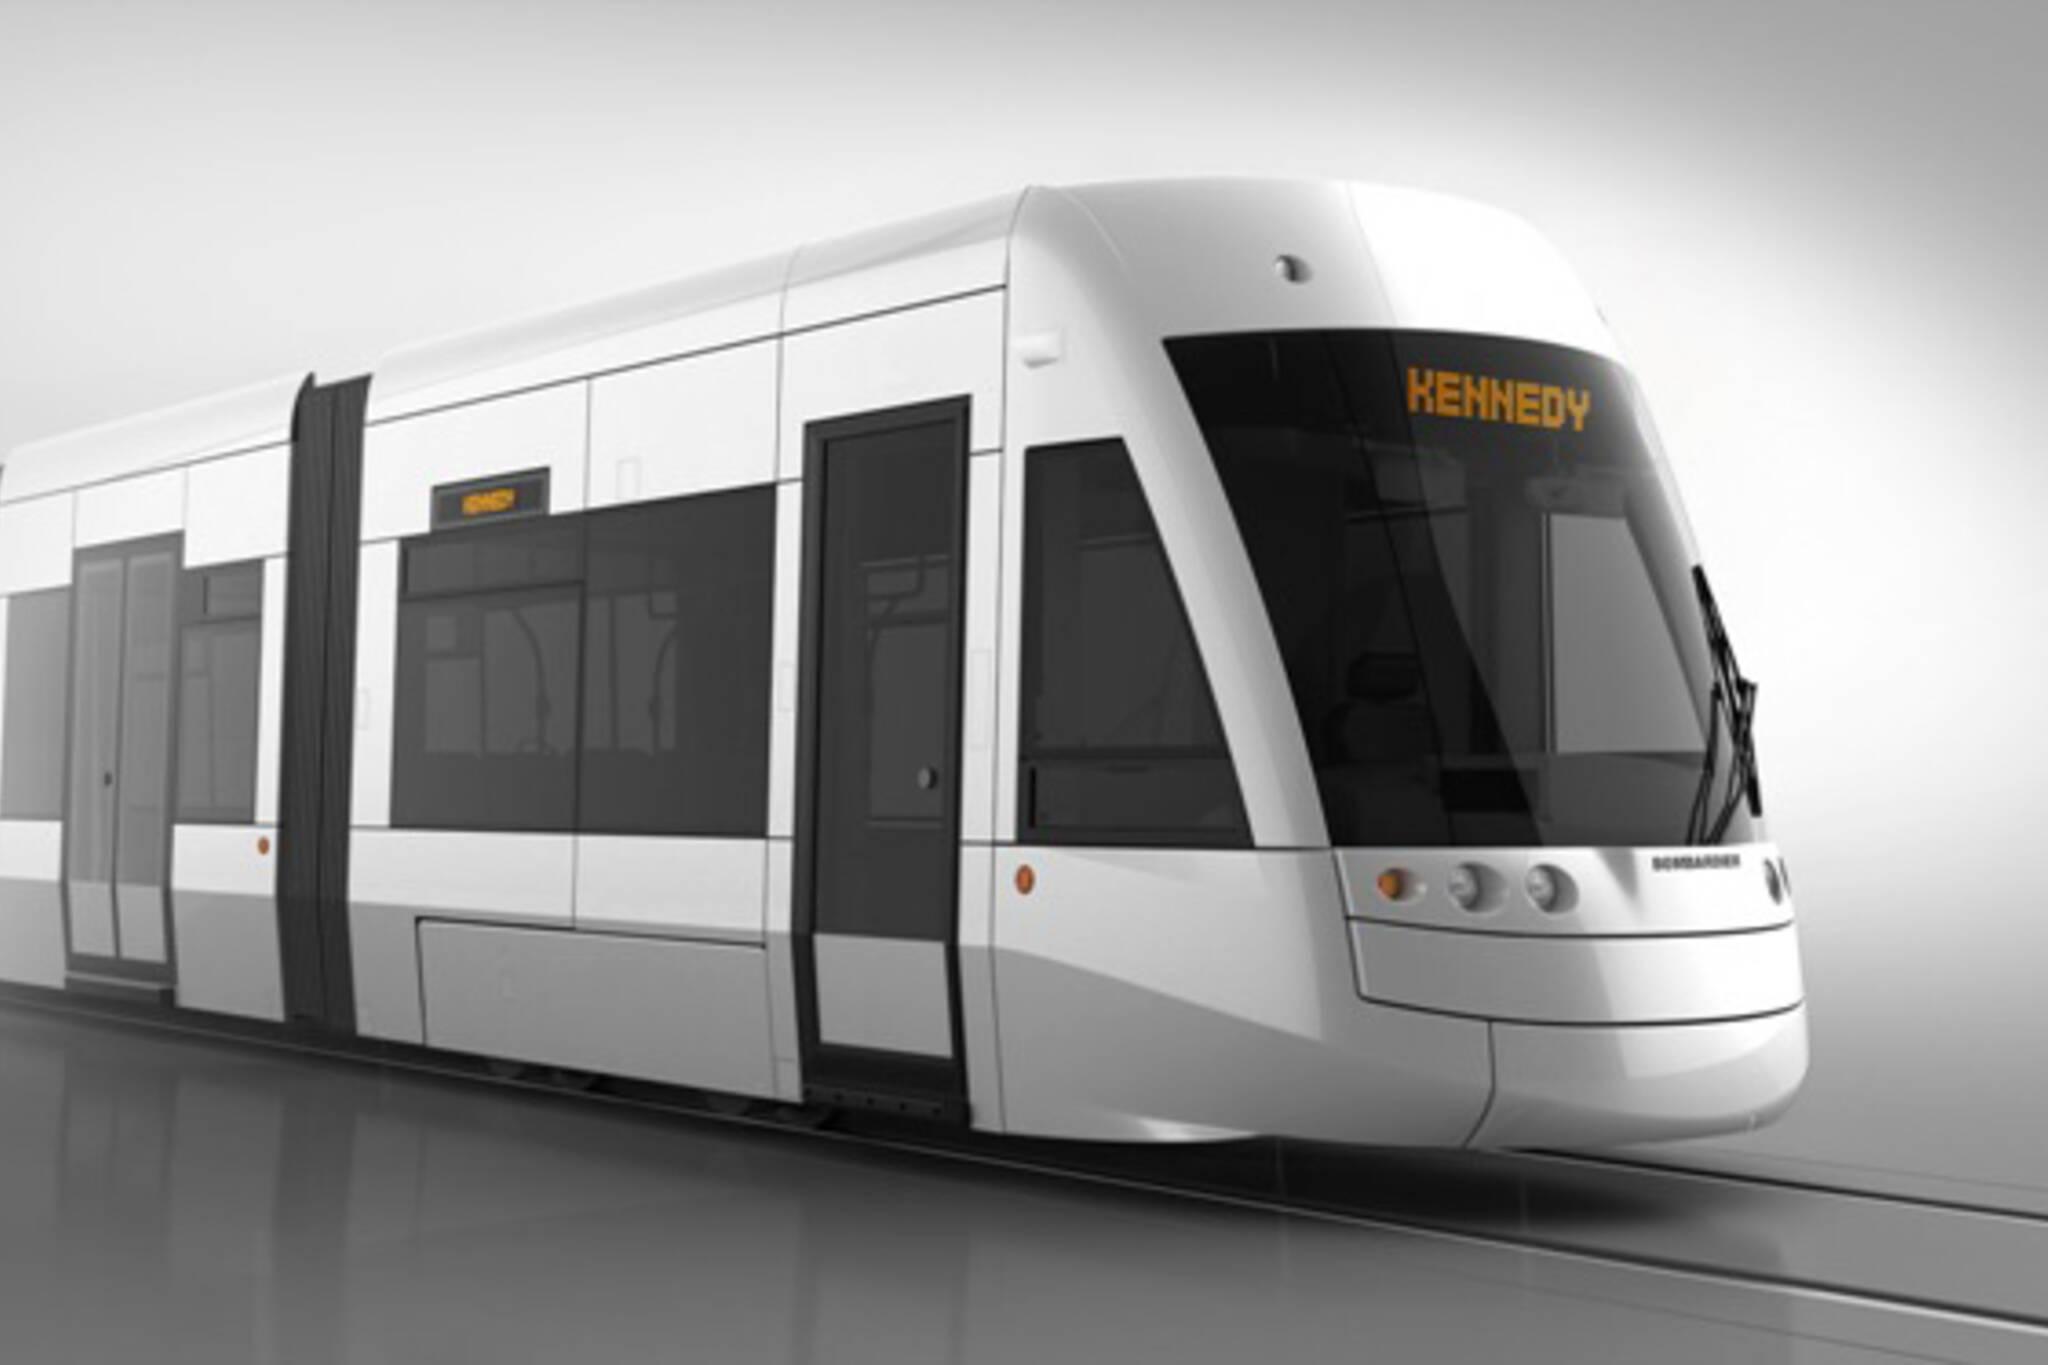 Eglinton Crosstown Transit Compromise